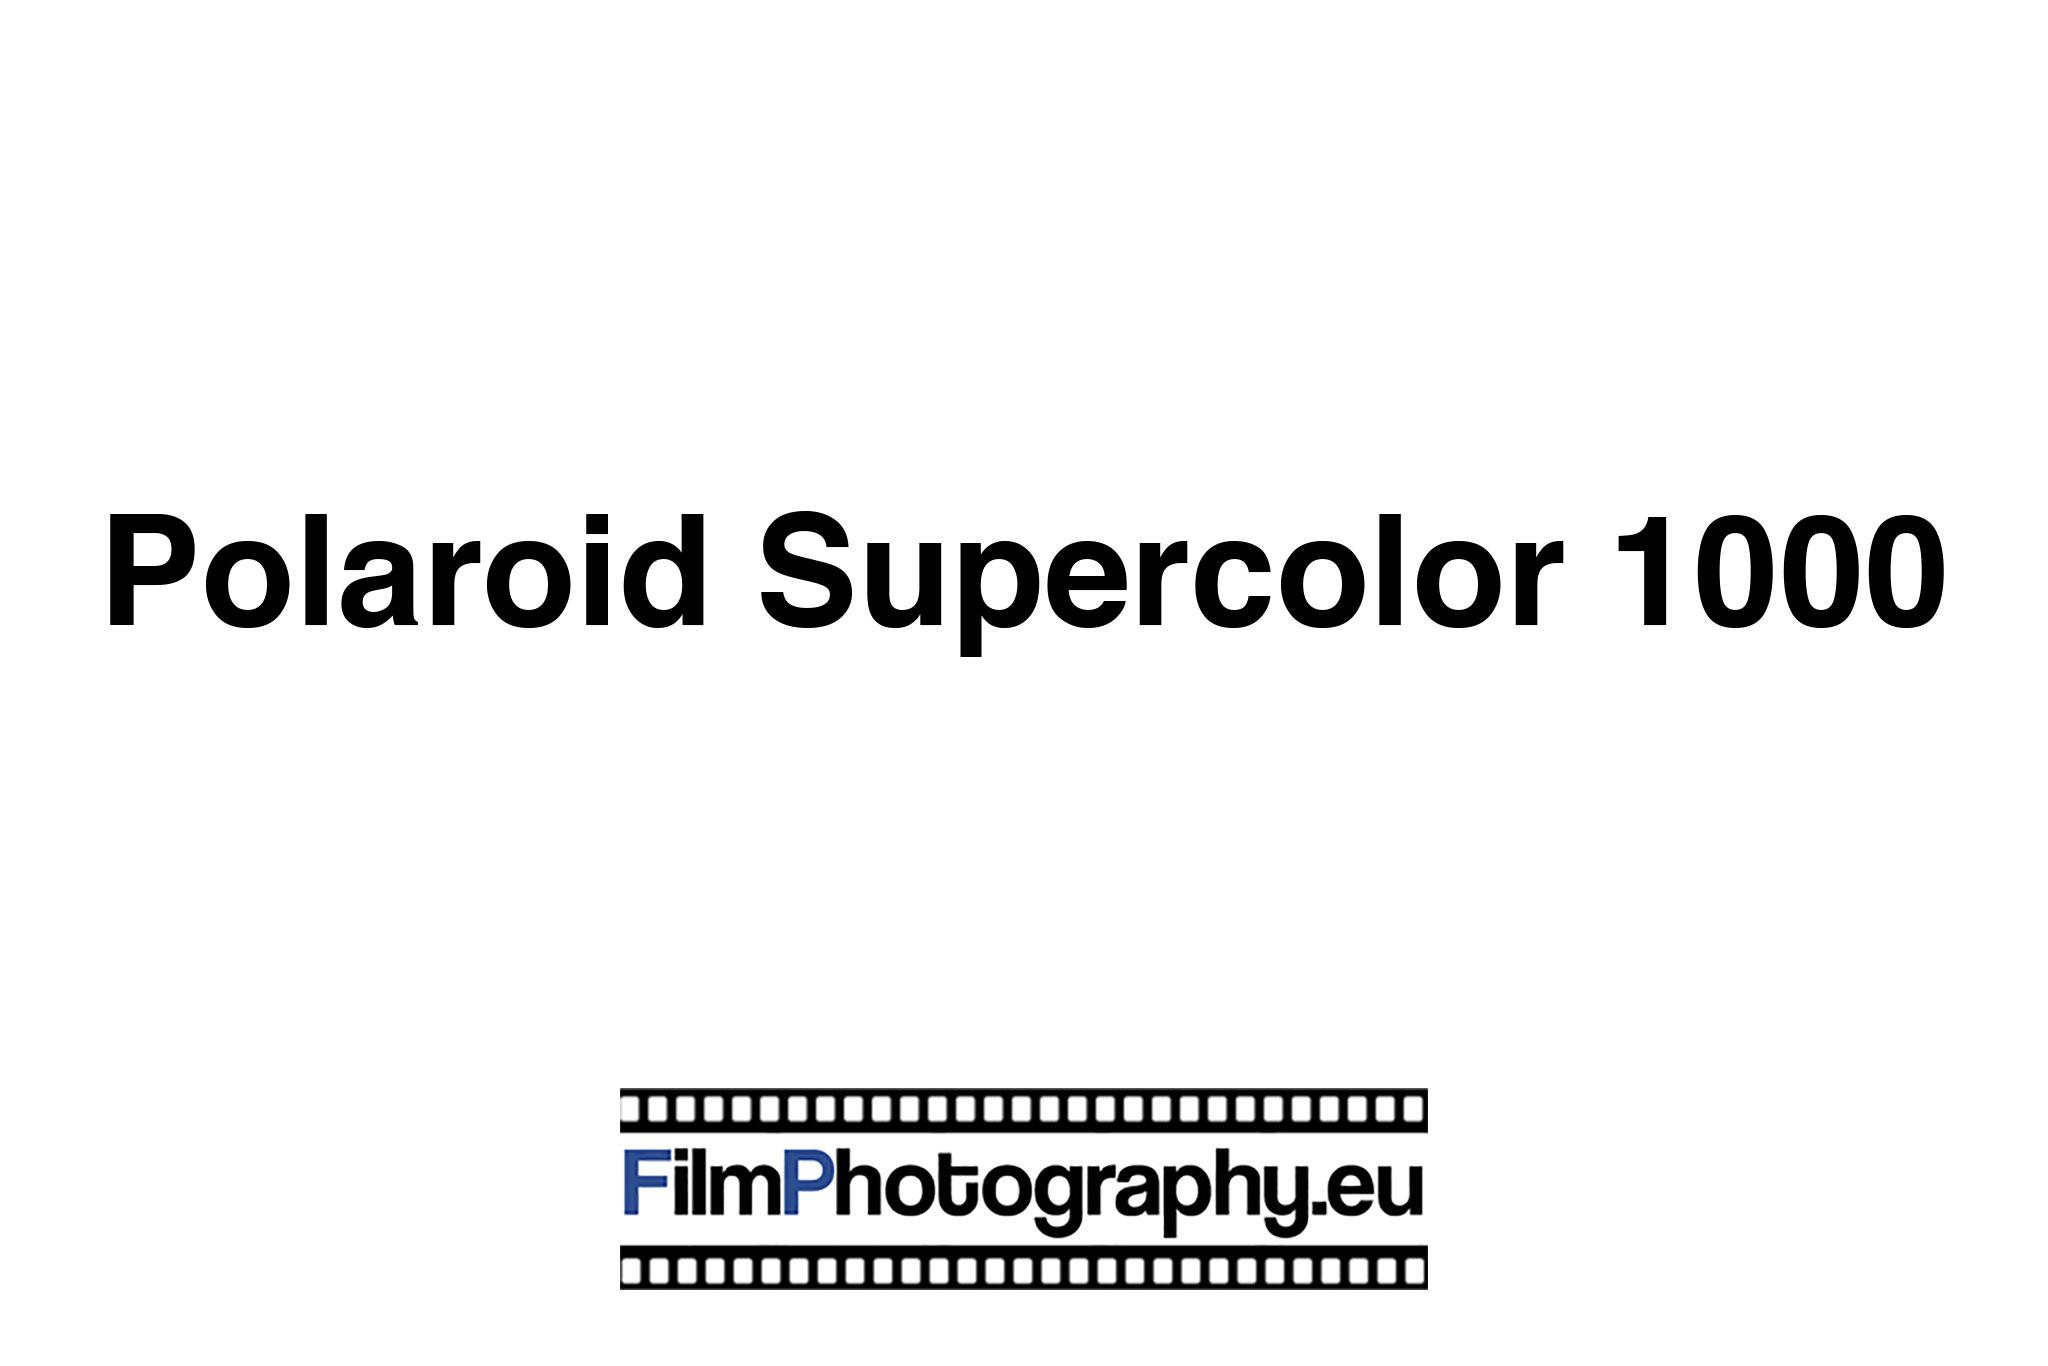 Polaroid 2000 Land Camera SX-70 Sofortbildkamera